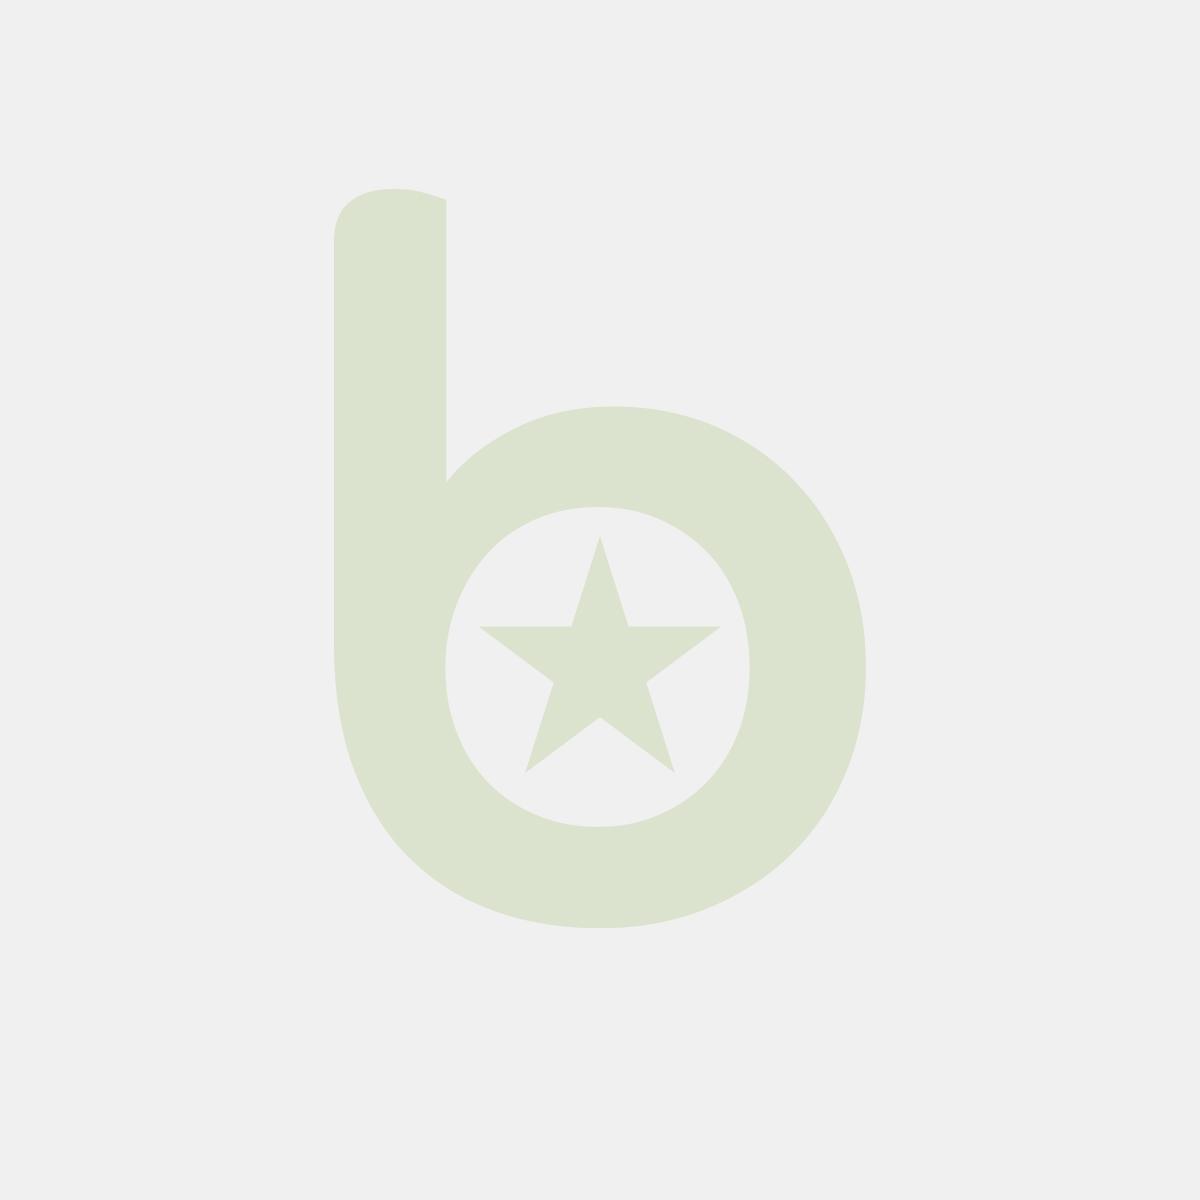 Płyta grillowa Tepanyaki Kitchen Line Gigant 900x200mm - kod 238301